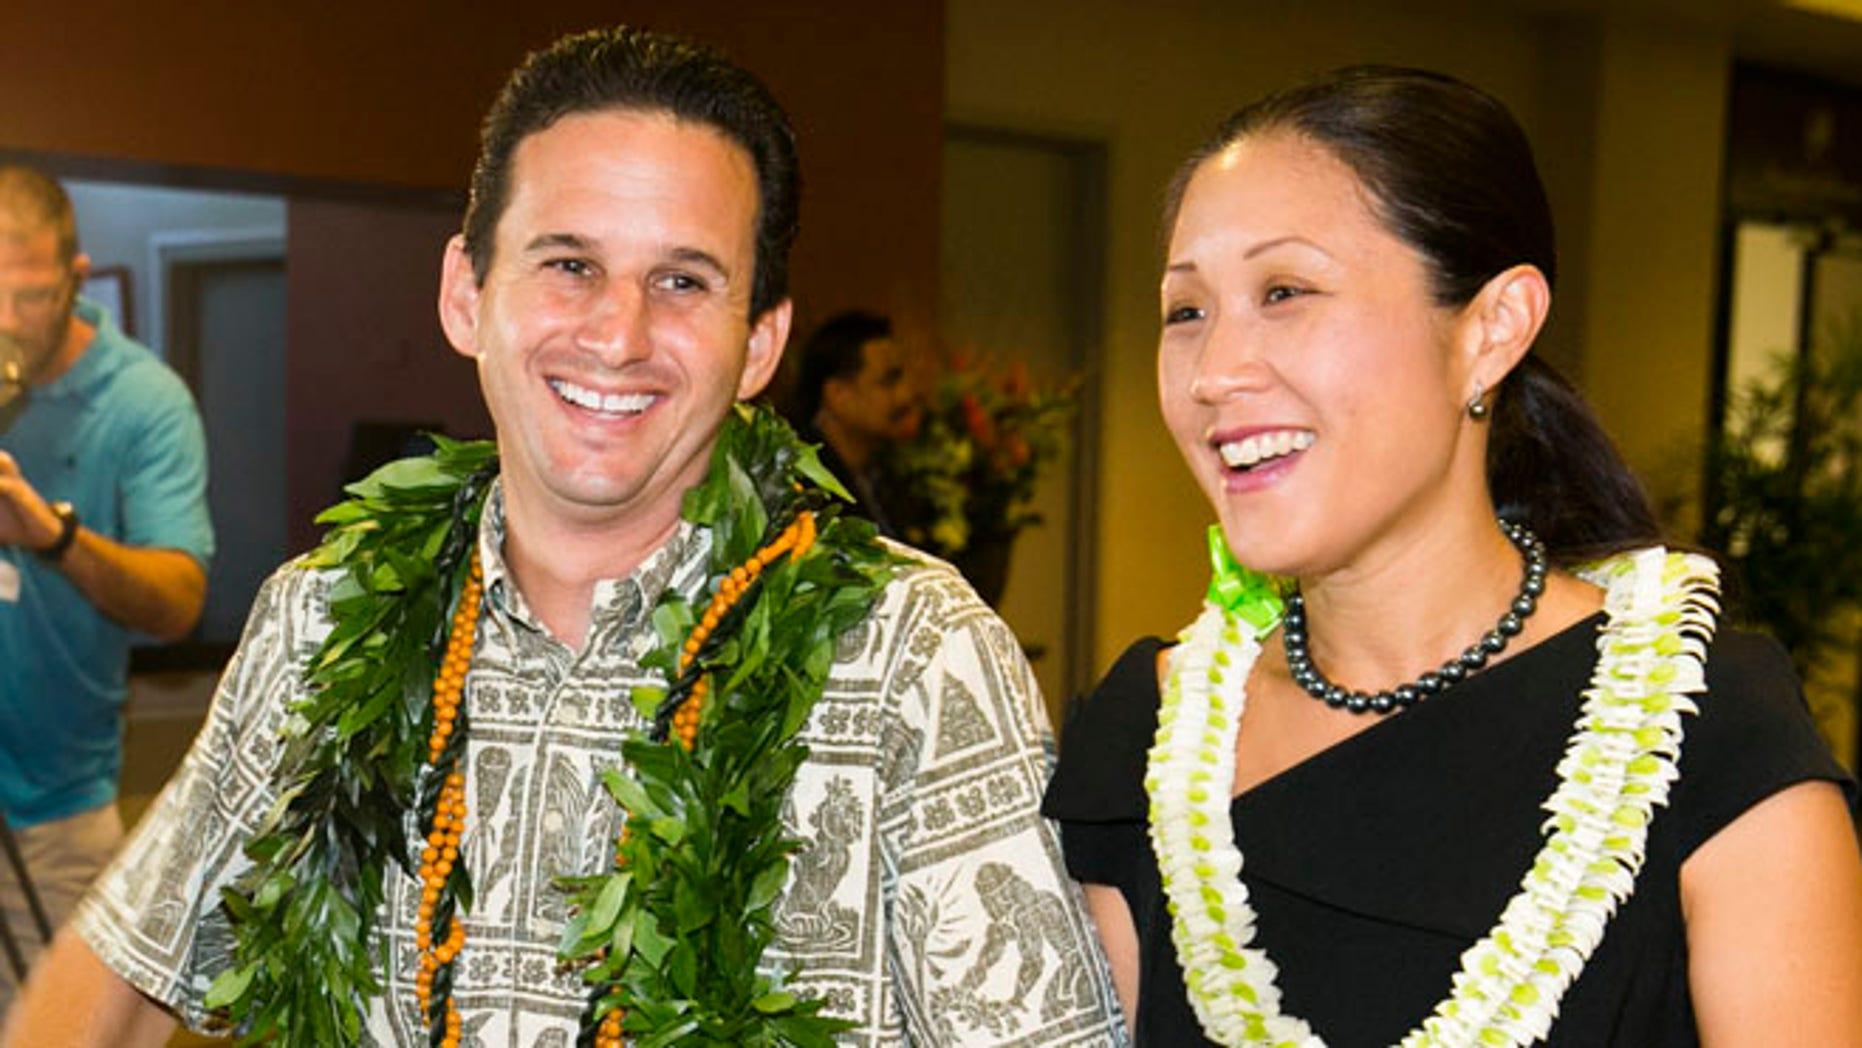 US Sen. Brian Schatz, left, and Linda Kwok Schatz attend the Democratic Unity Breakfast, Sunday, Aug. 10, 2014 in Honolulu.